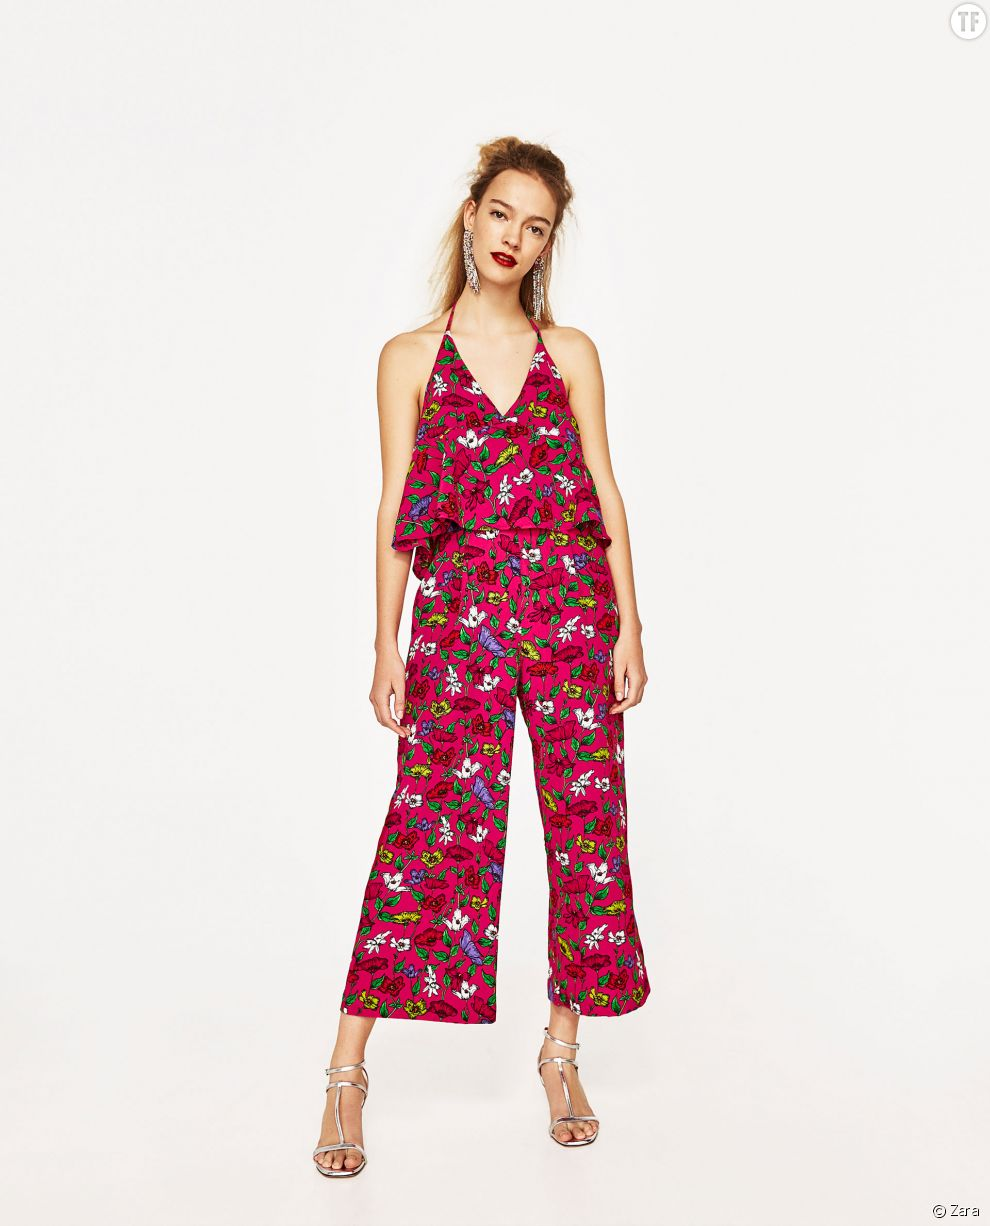 Combinaison imprimé fleuri Zara, 29,99€